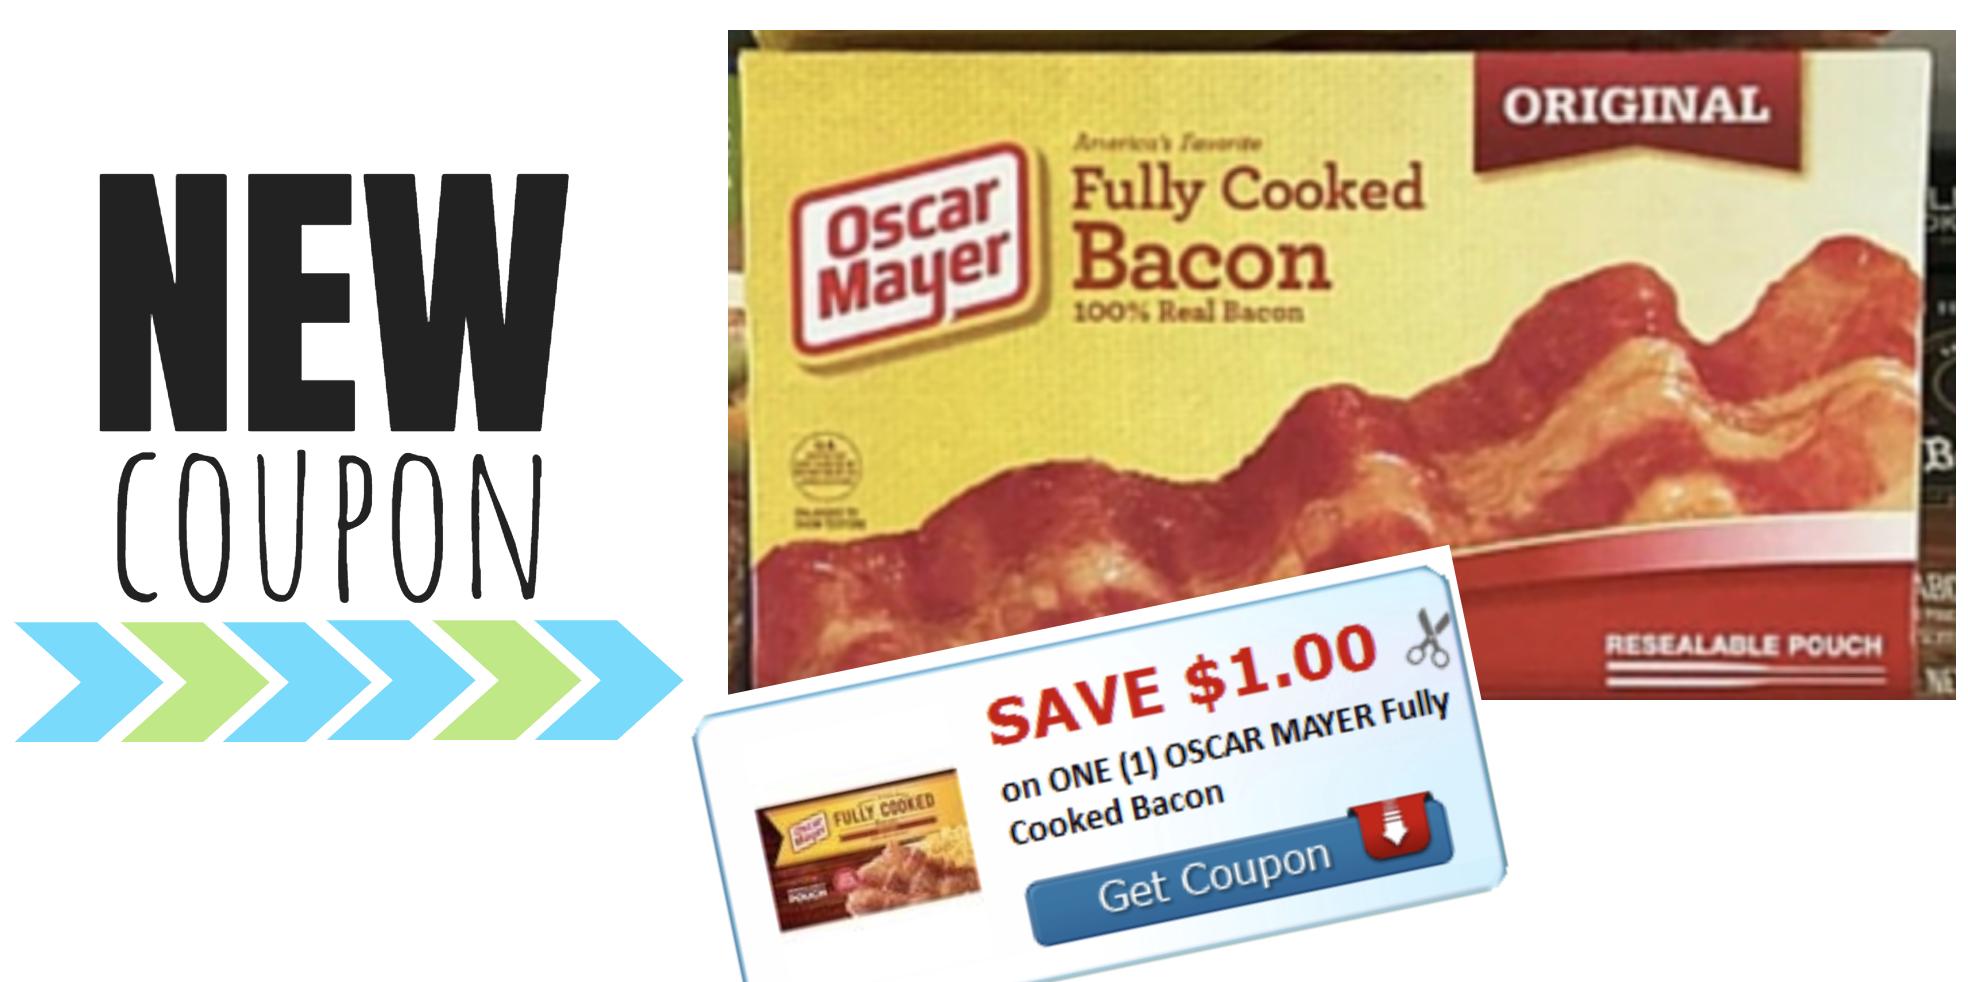 New Oscar Mayer Bacon Coupon - Moola Saving Mom - Free Printable Oscar Mayer Coupons